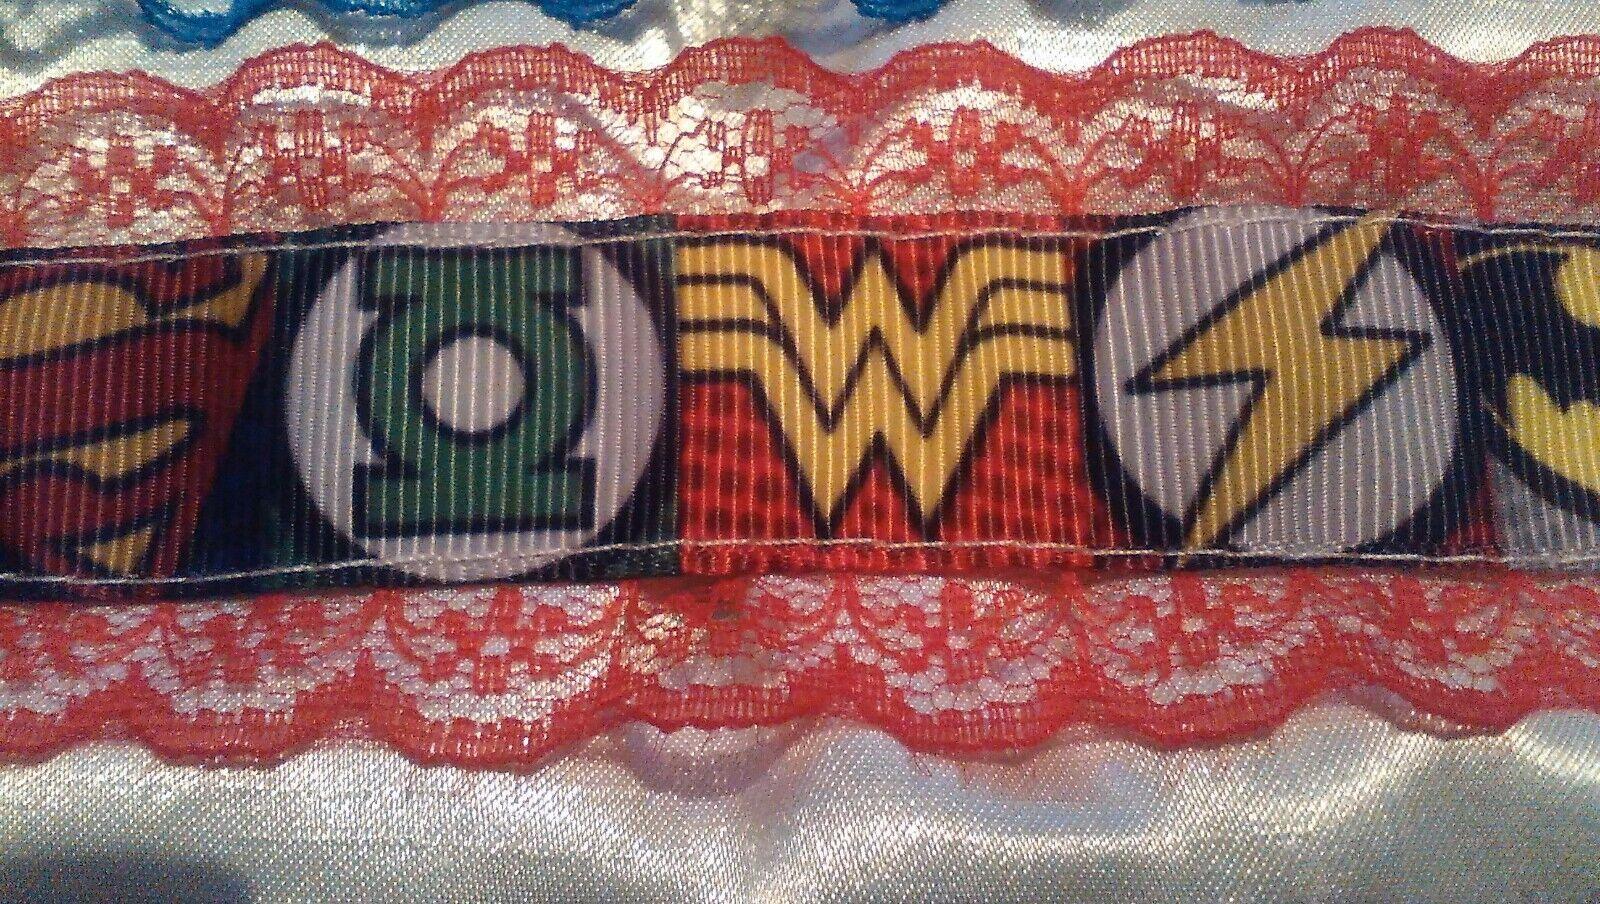 marvel wedding garter red lace burlesque super hero